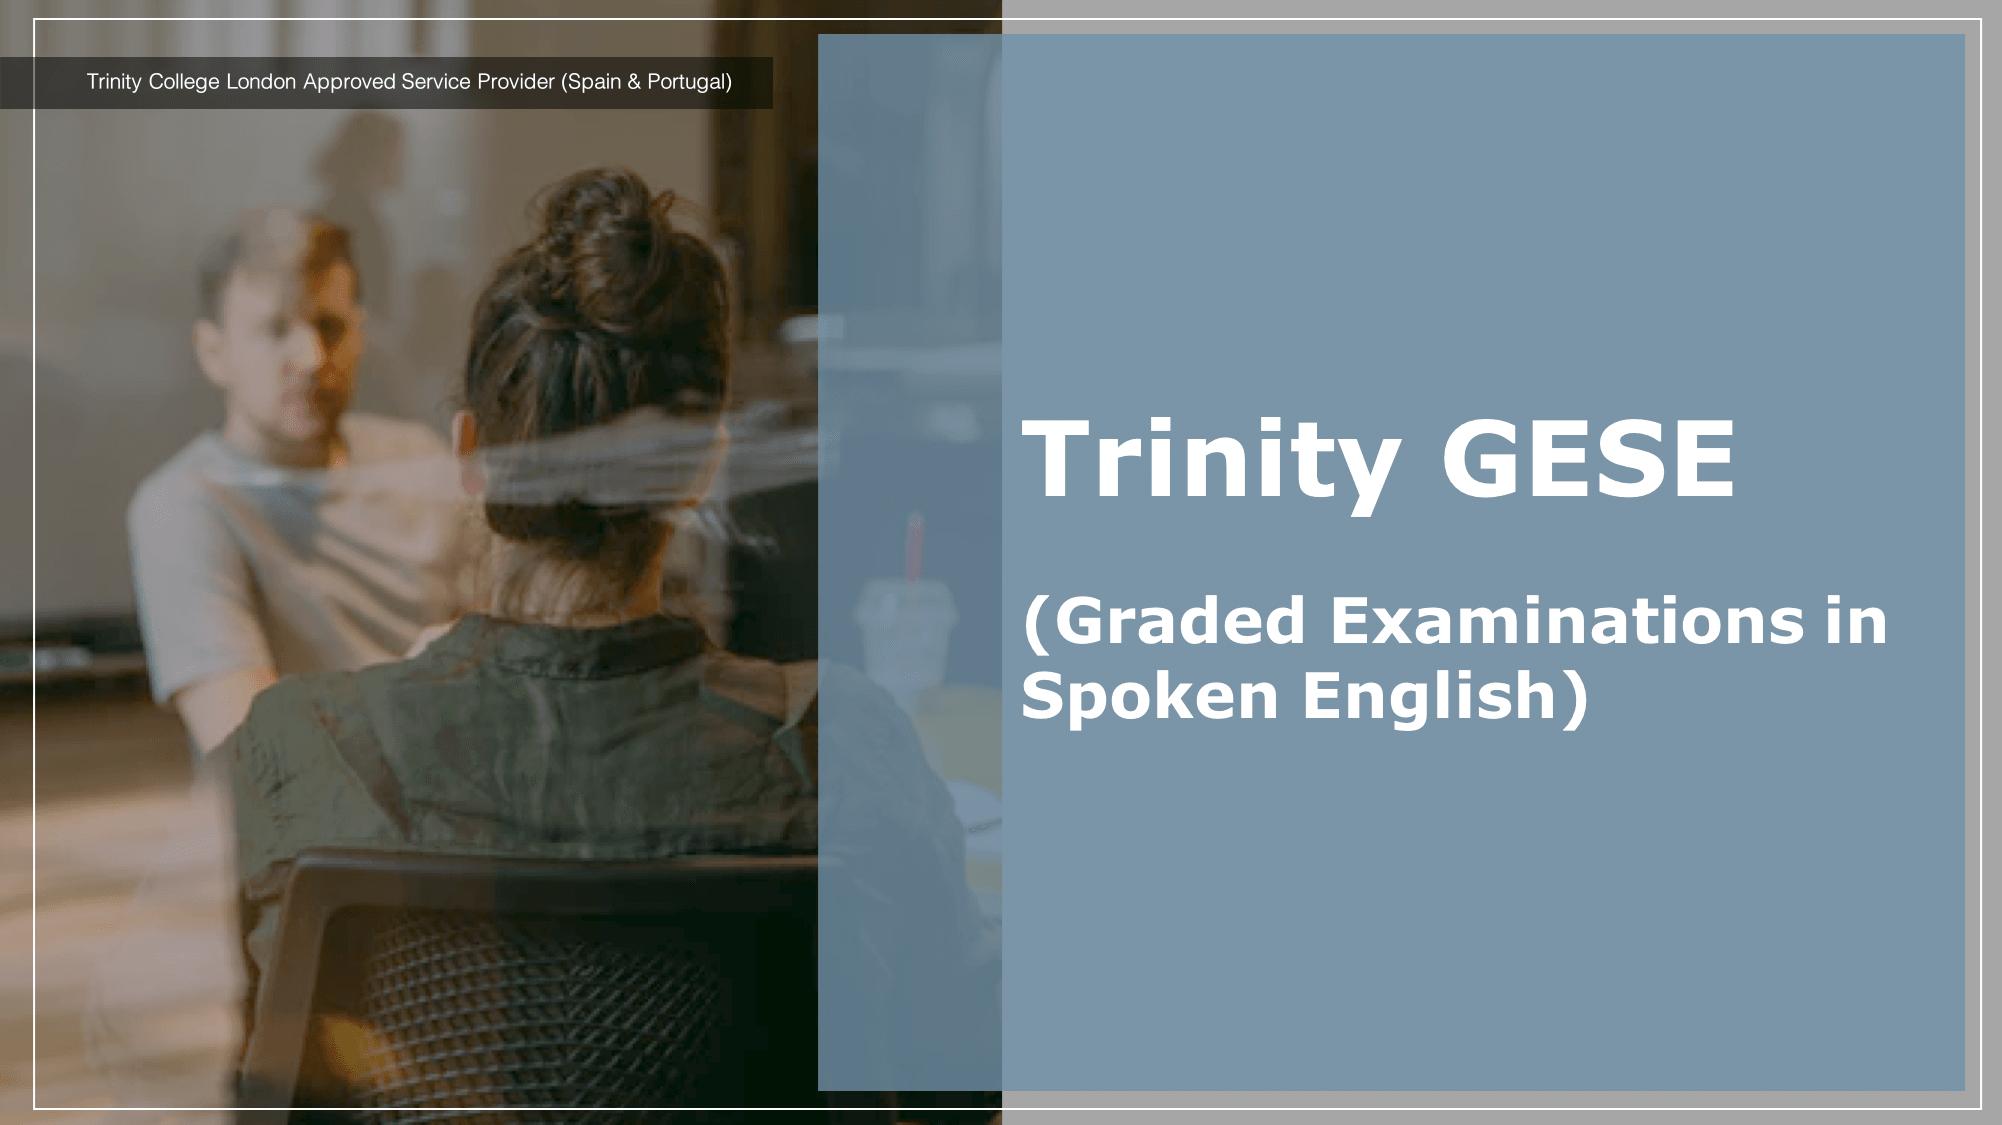 Trinity GESE (Graded Examinations in Spoken English)